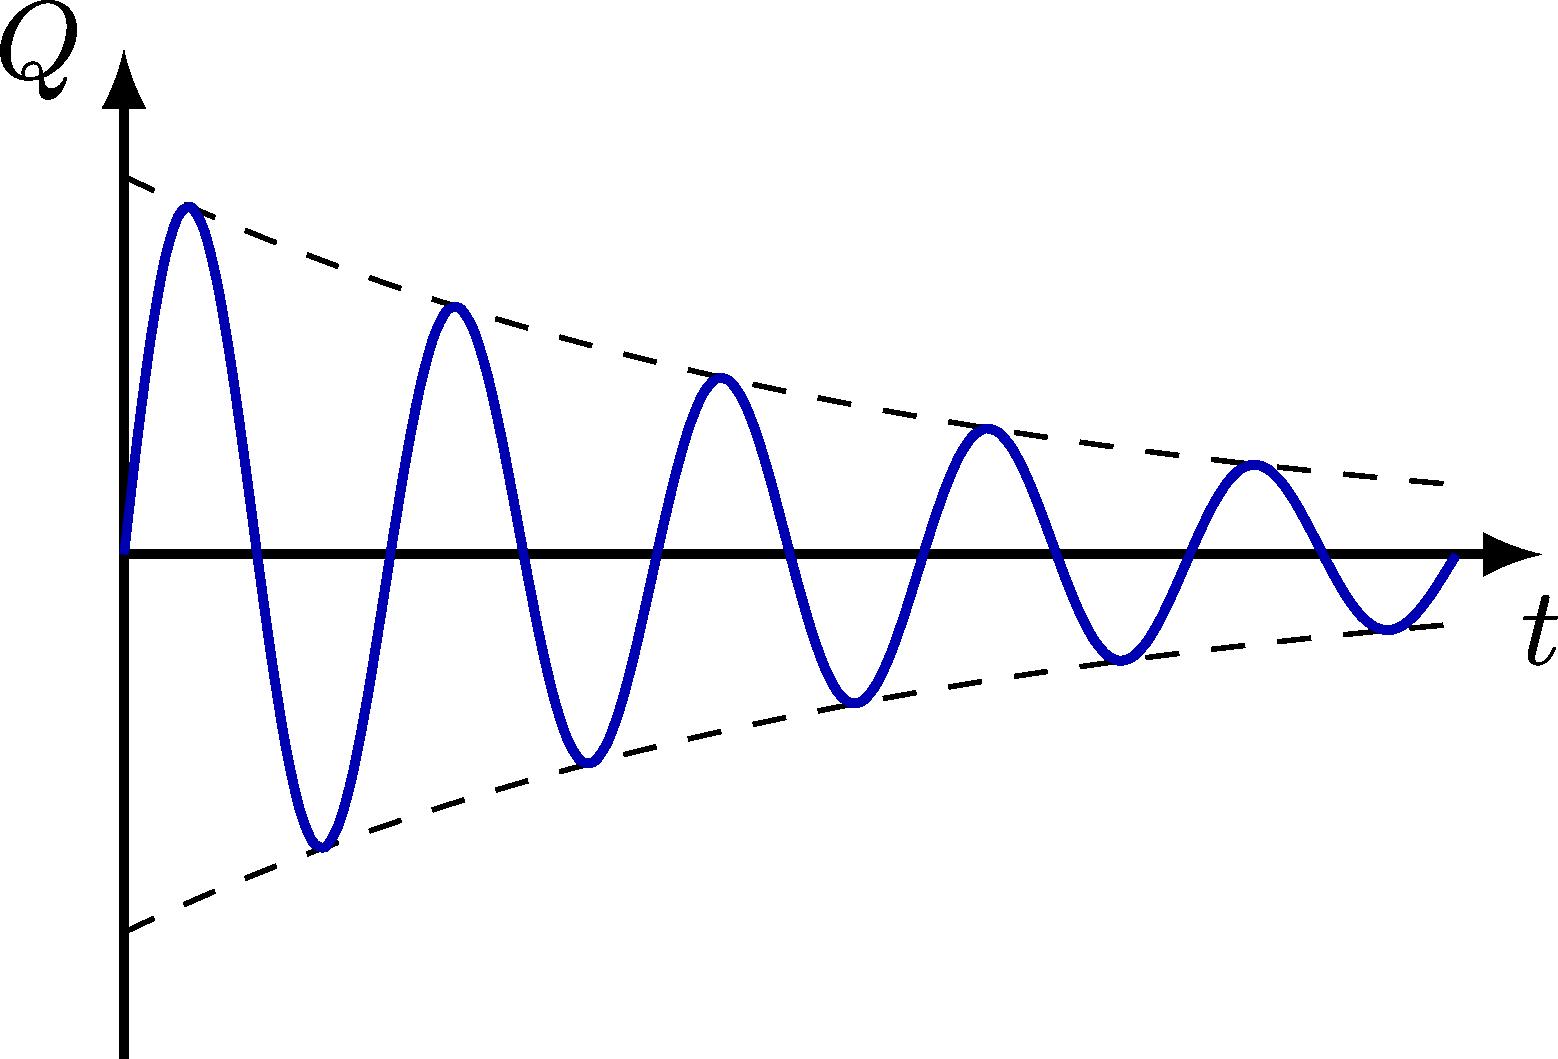 electric_circuit_plots-012.png